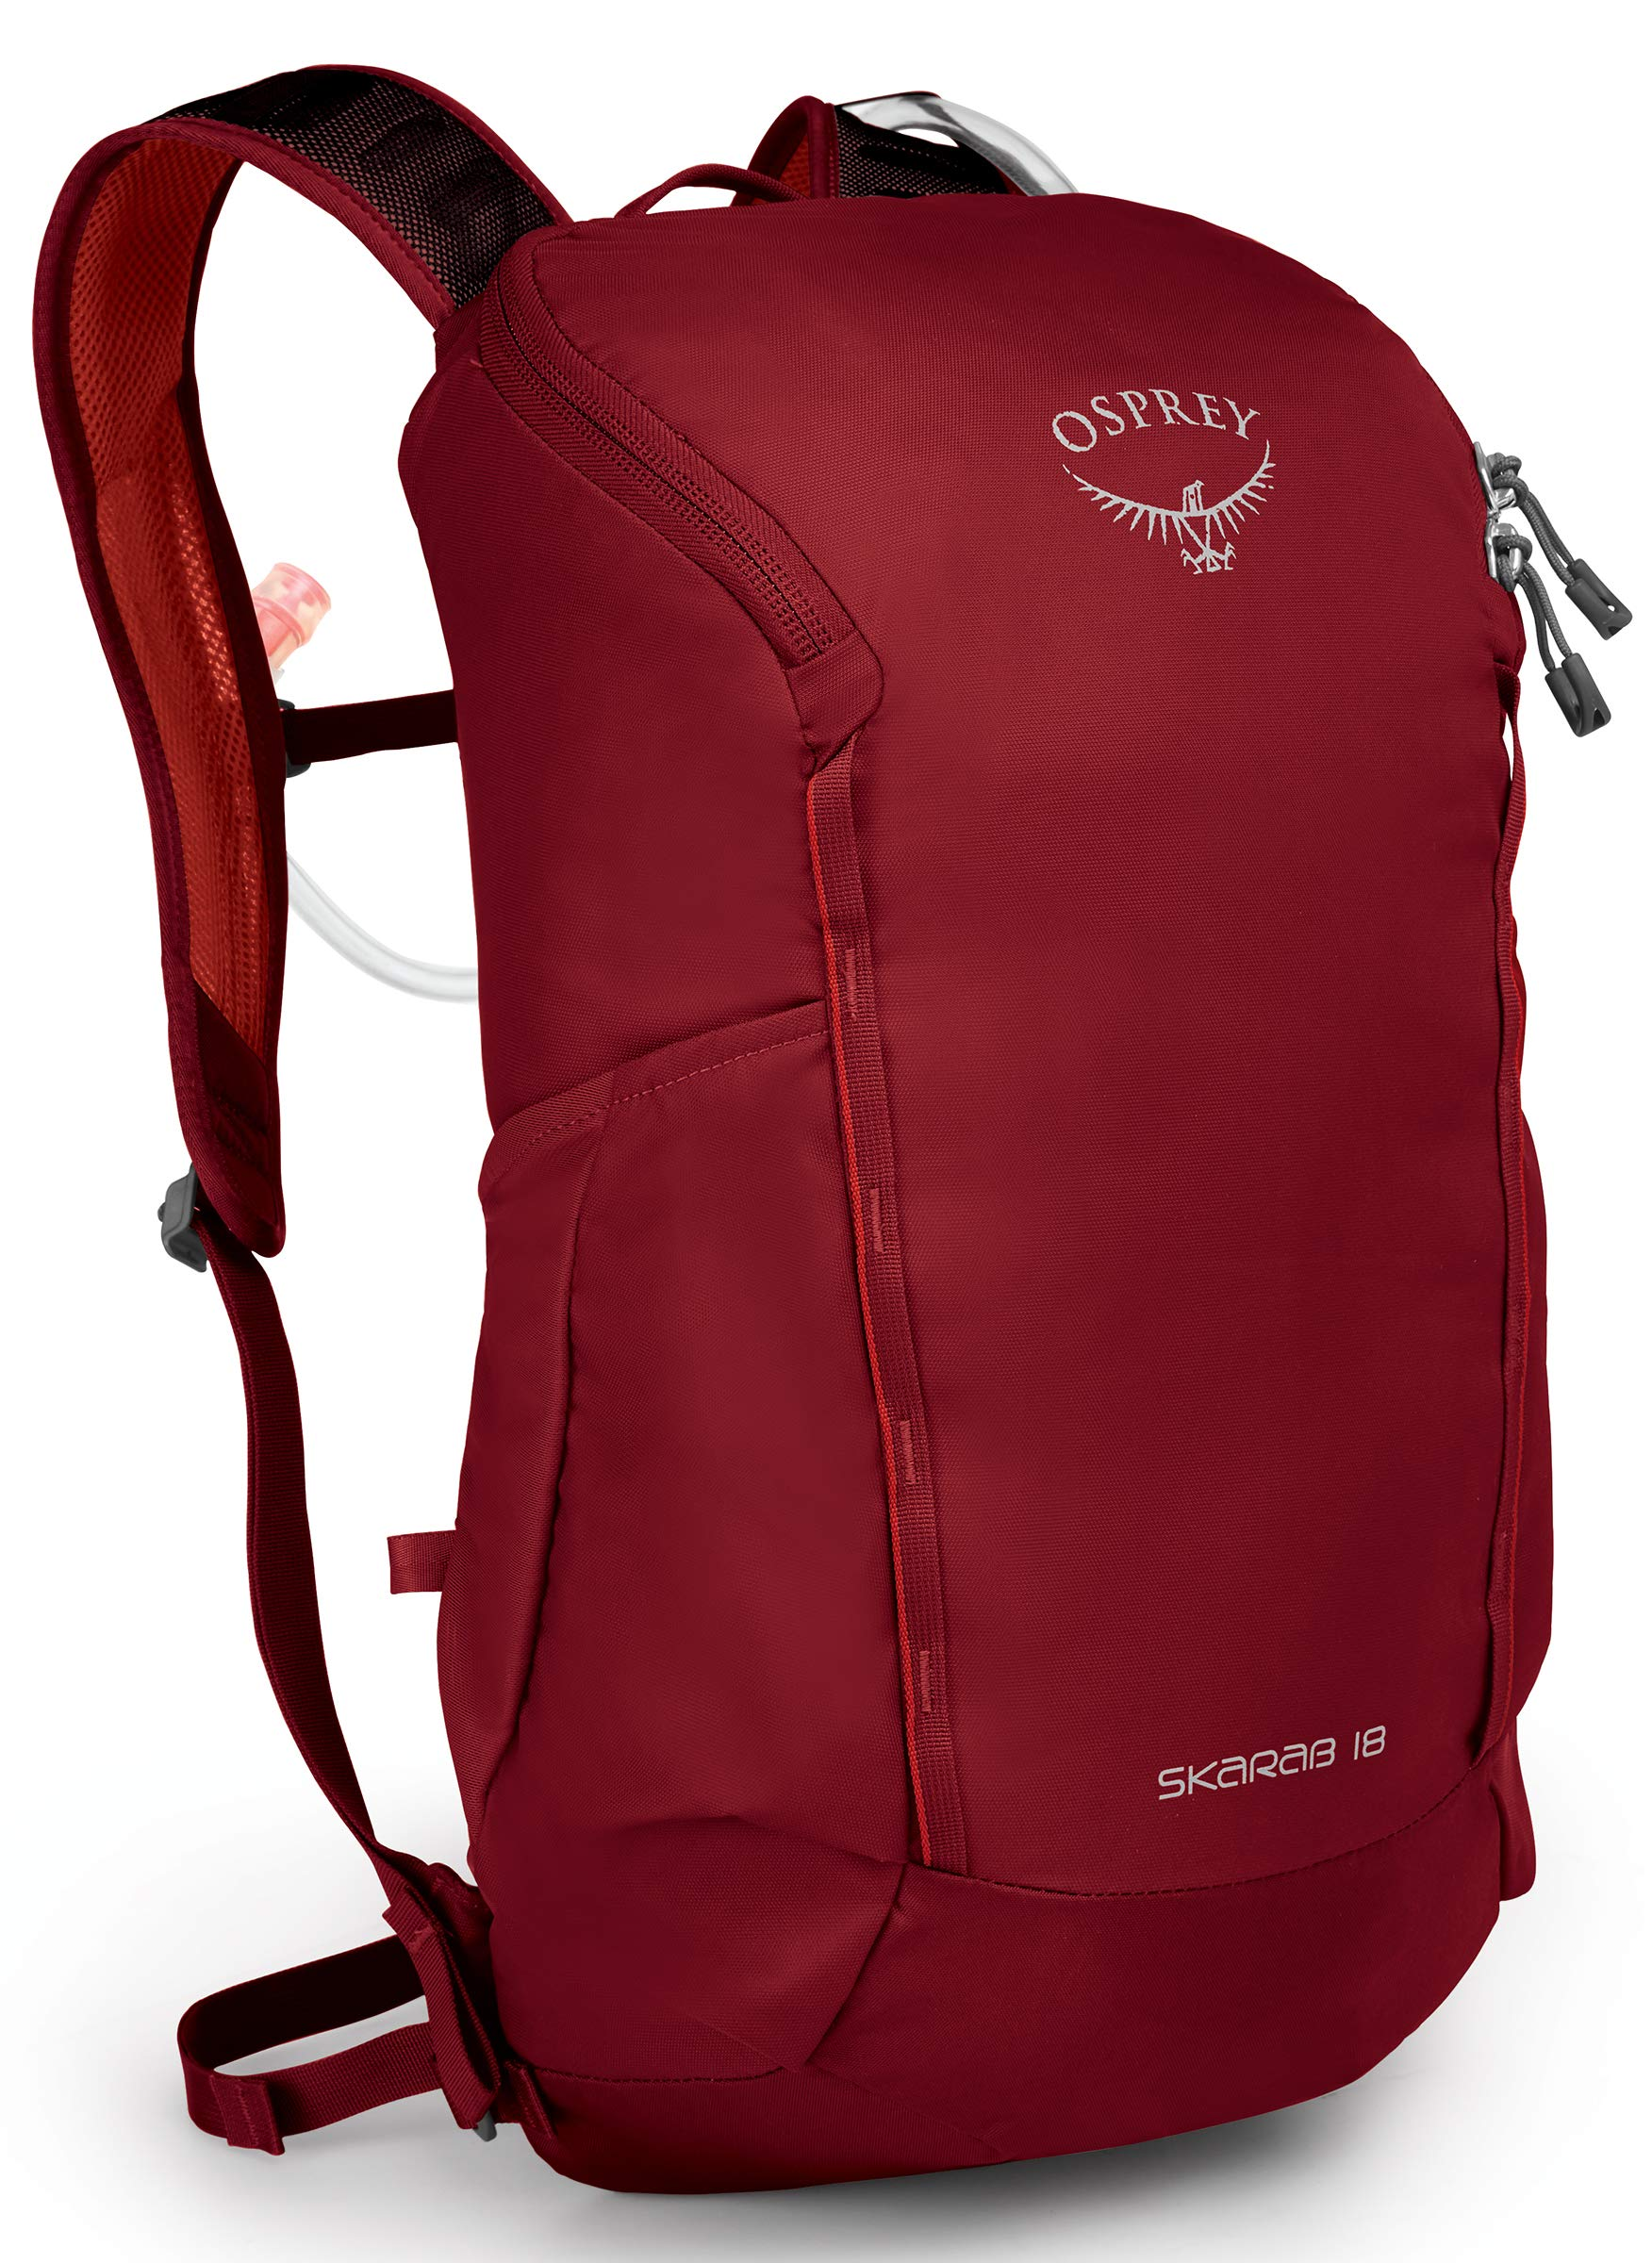 Osprey Packs Skarab 18 Hydration Pack, Mystic Red, One Size